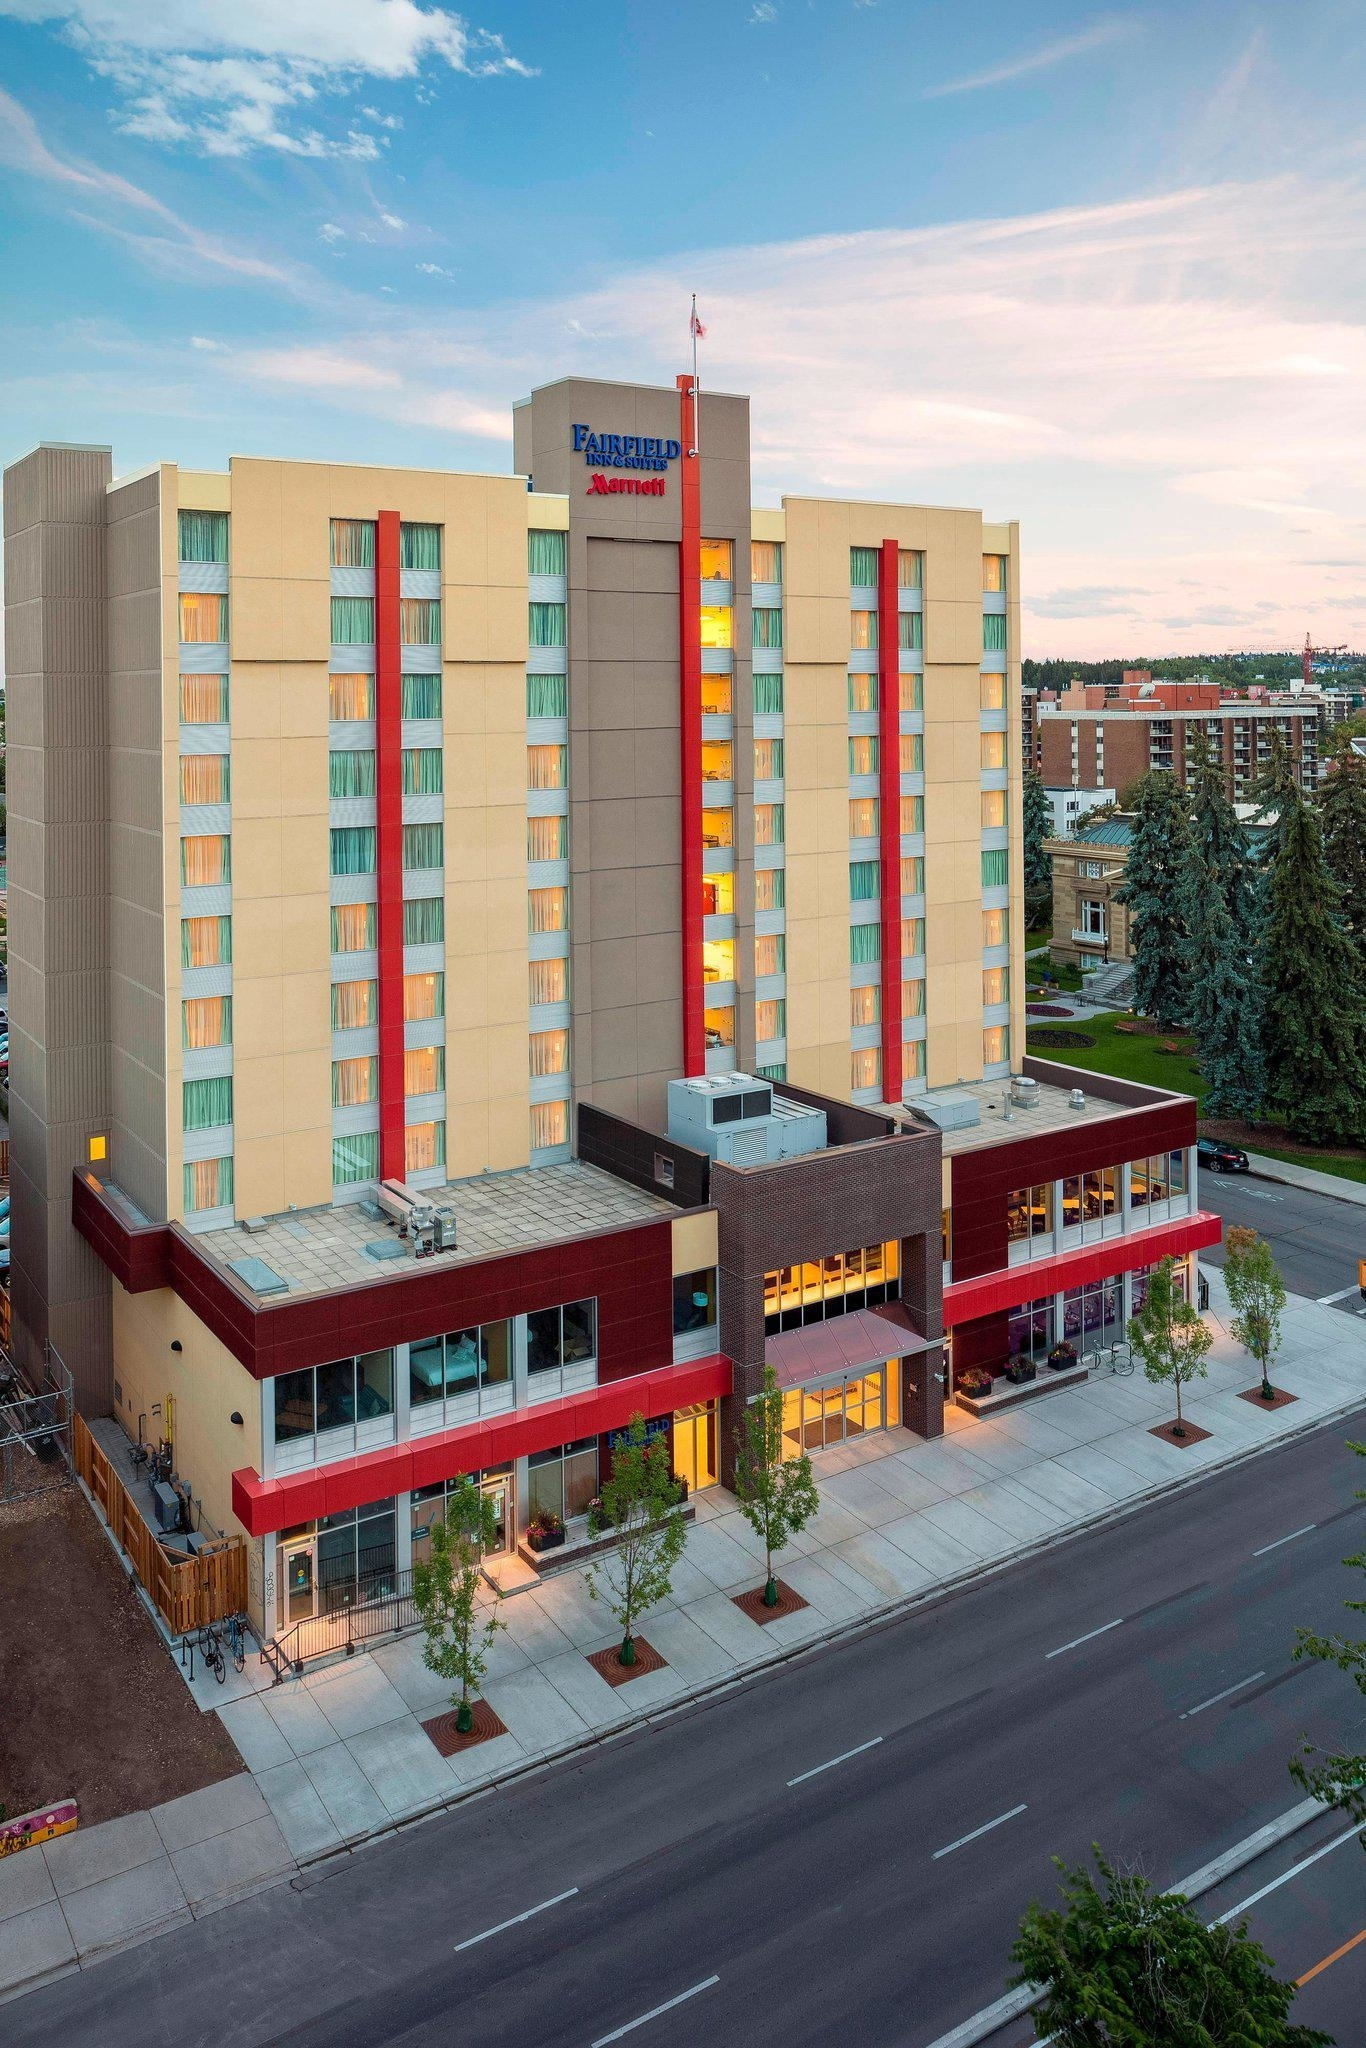 Fairfield Inn & Suites by Marriott Calgary Downtown - Hotels